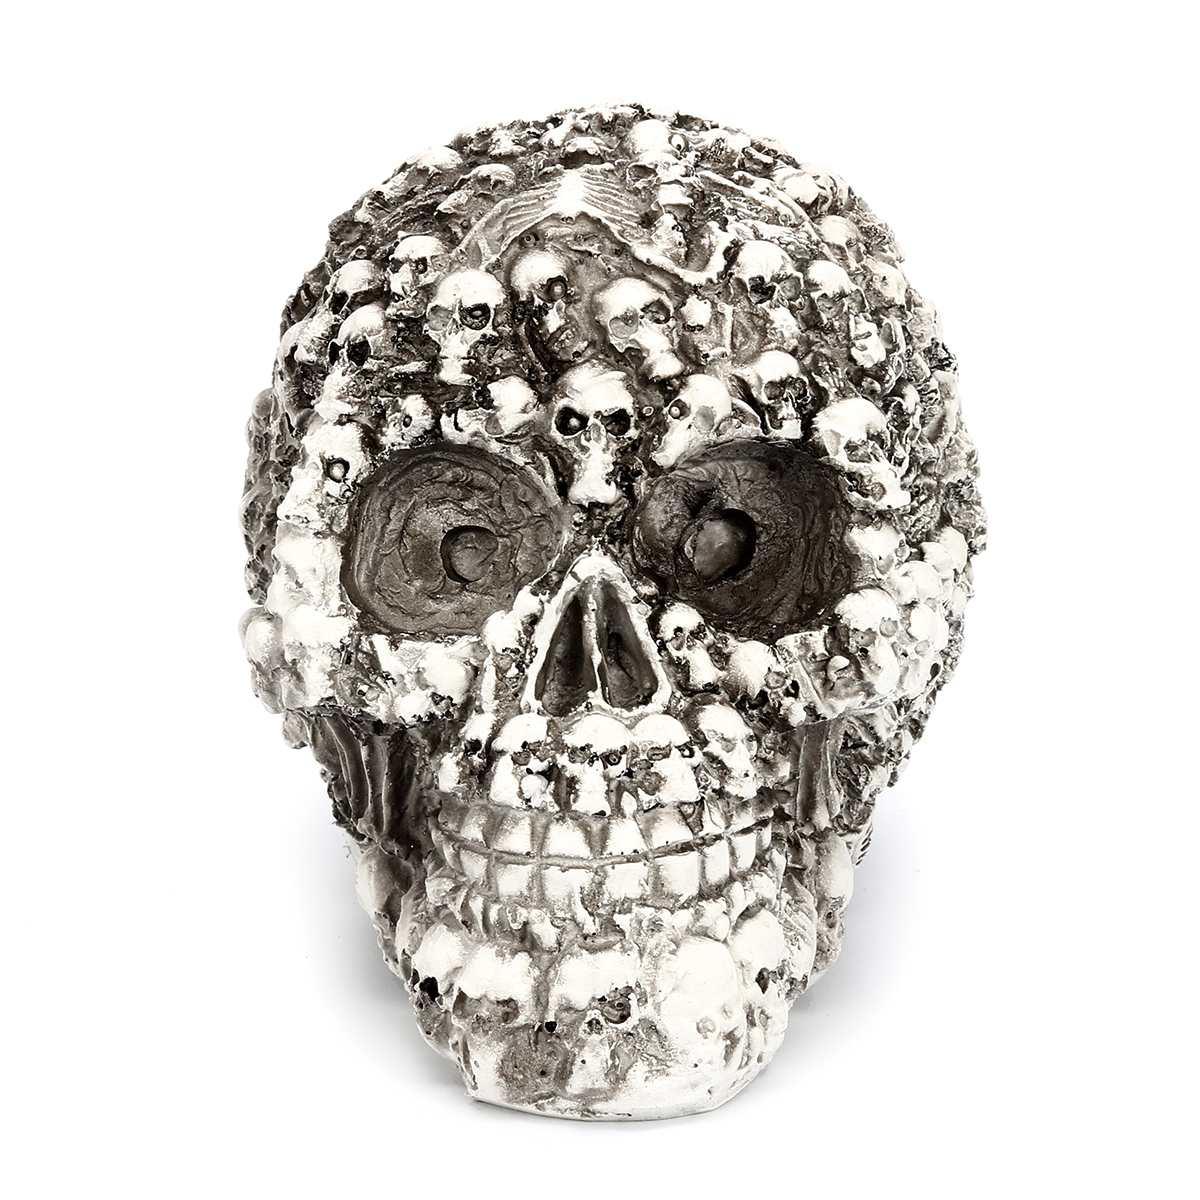 Resin Craft Skull Statues & Sculptures Garden Statues Sculptures Skull Ornaments Art Carving Statue